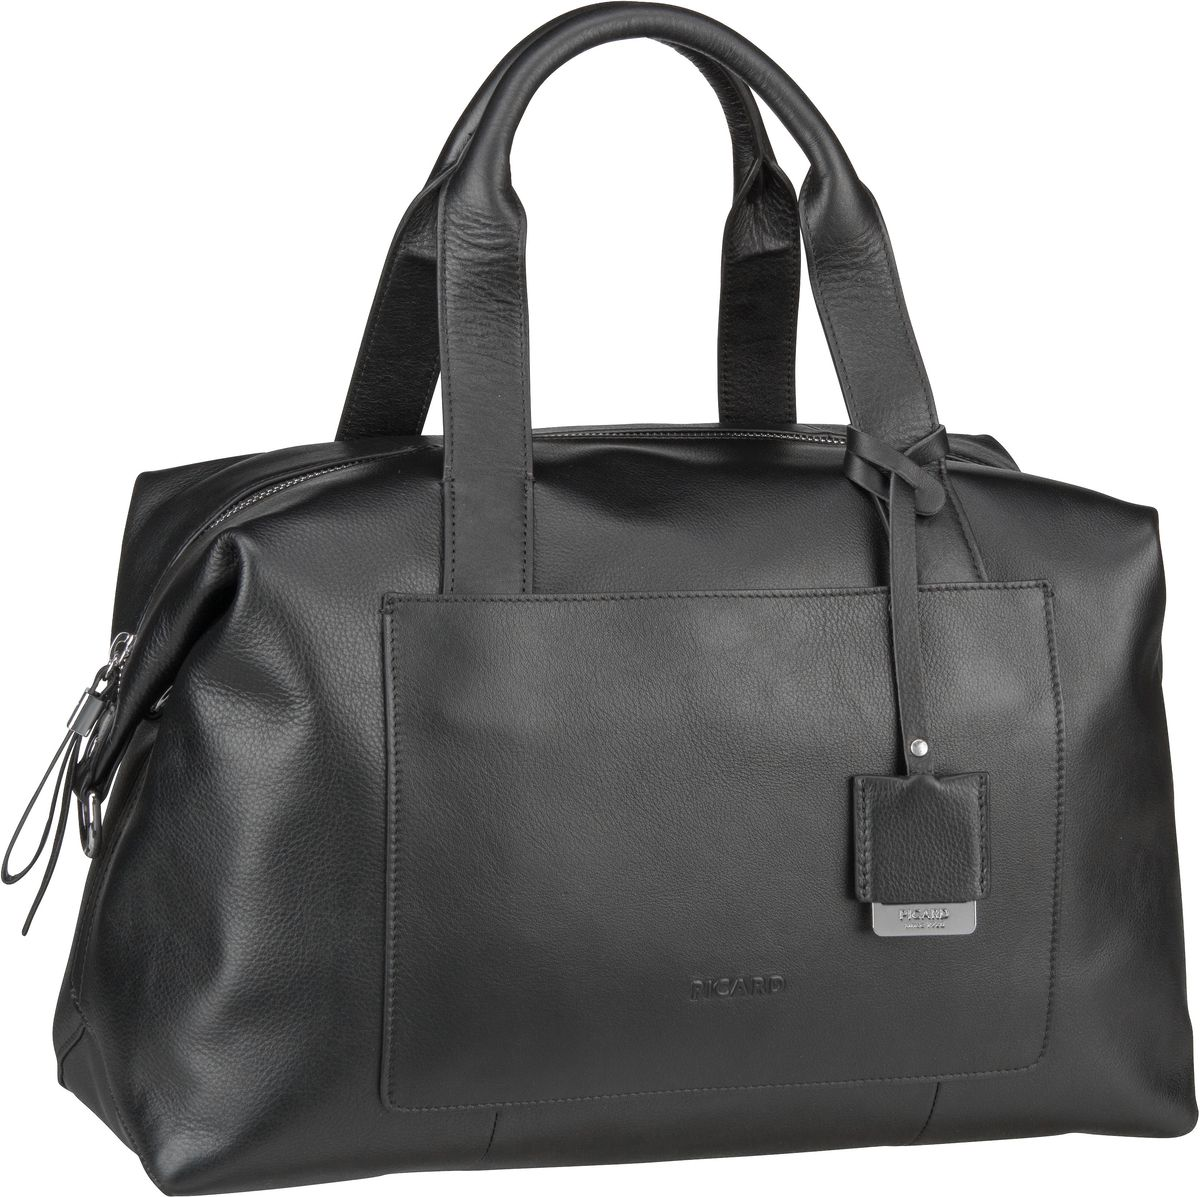 Handtasche Mellow 9303 Schwarz